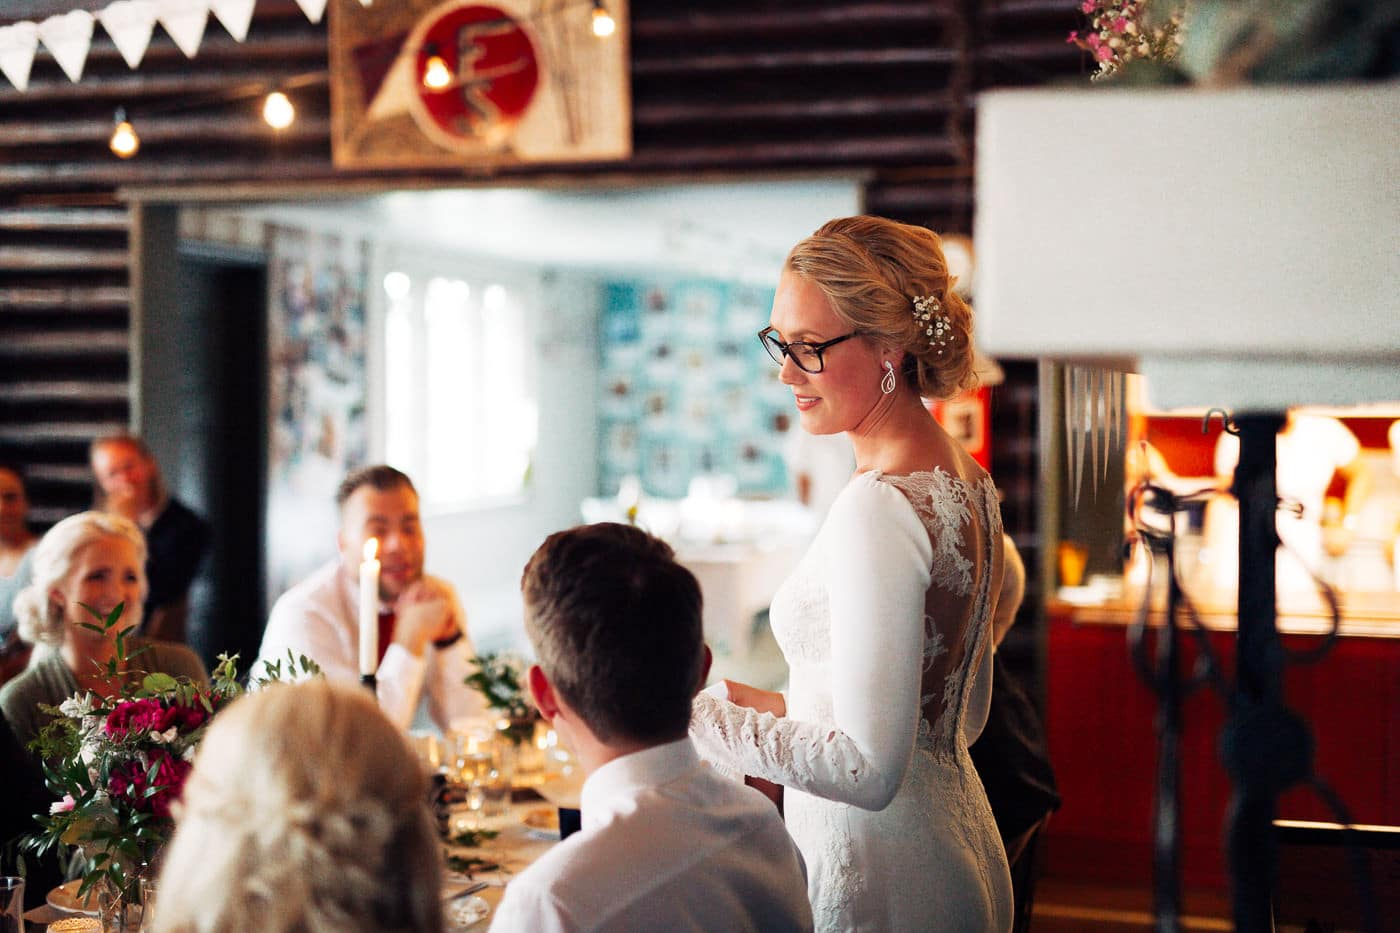 Karoline & Andreas - bryllup i Østfold med magiske detaljer Bryllup Fredrikstad Fotograf 71